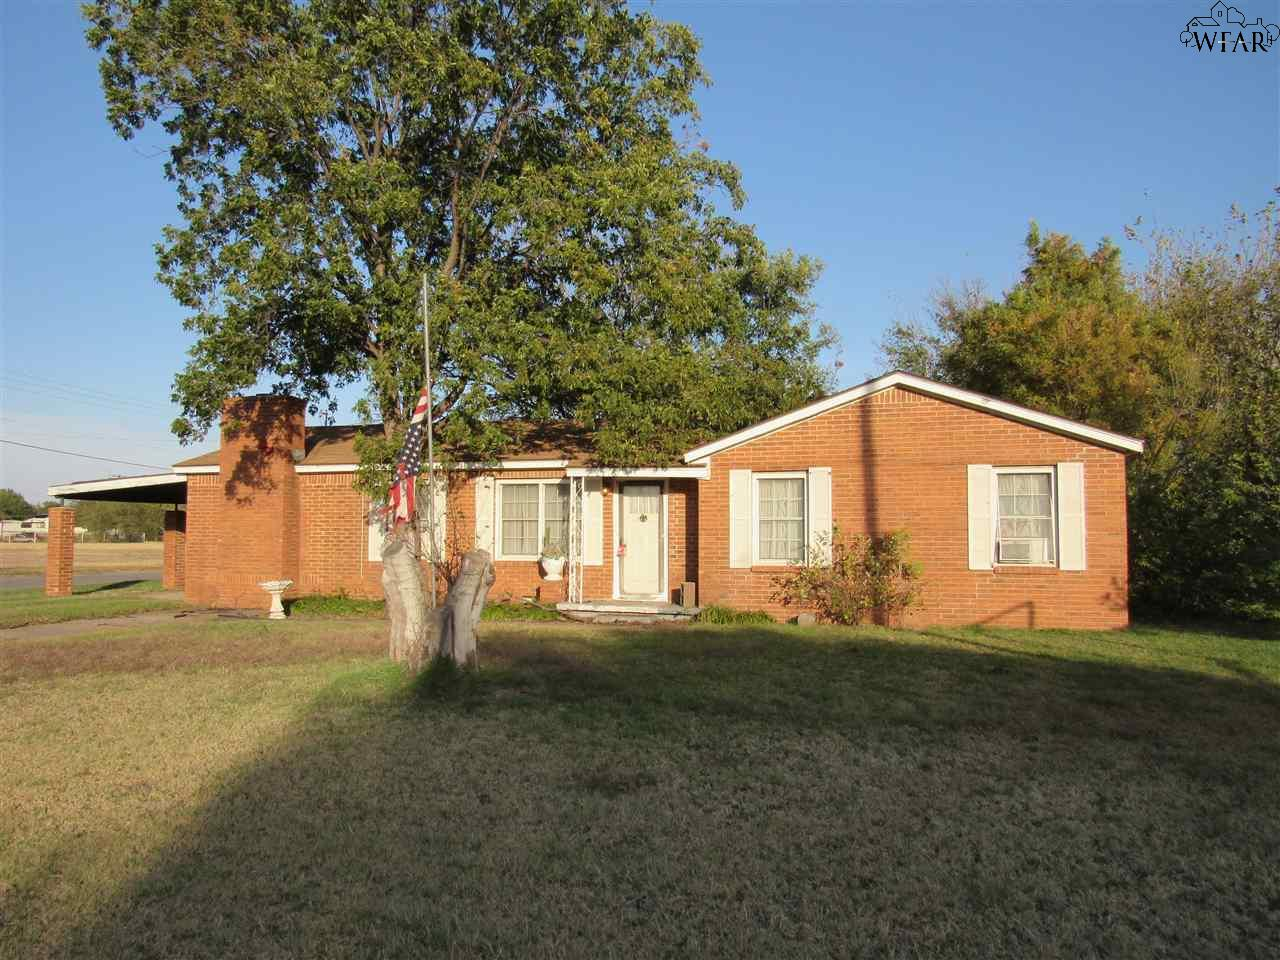 1213 S Fm 368, Iowa Park, TX 76367